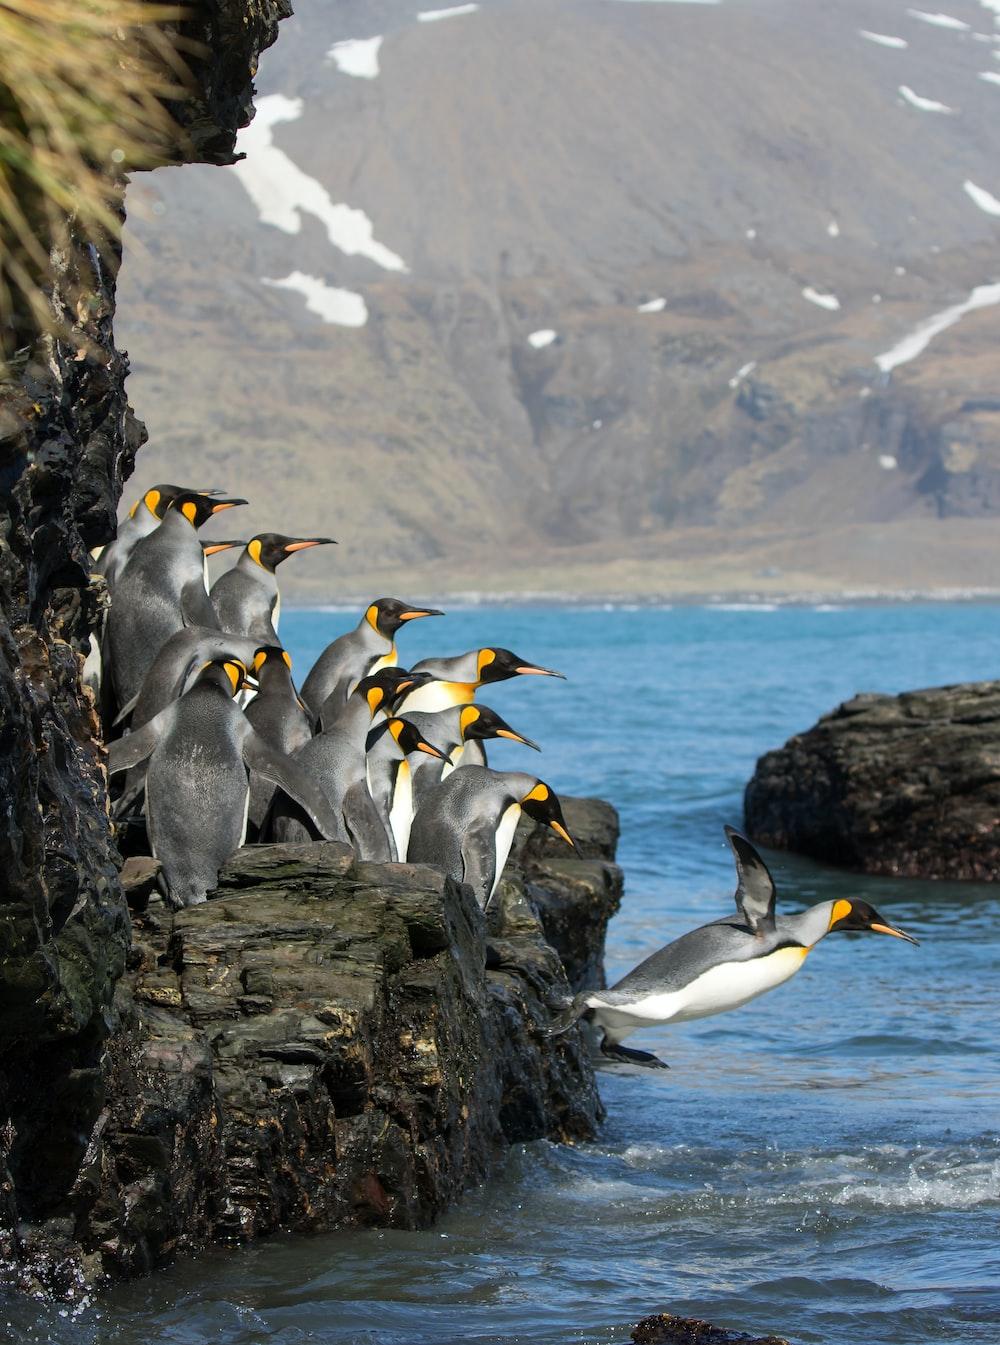 penguins standing on rock formation